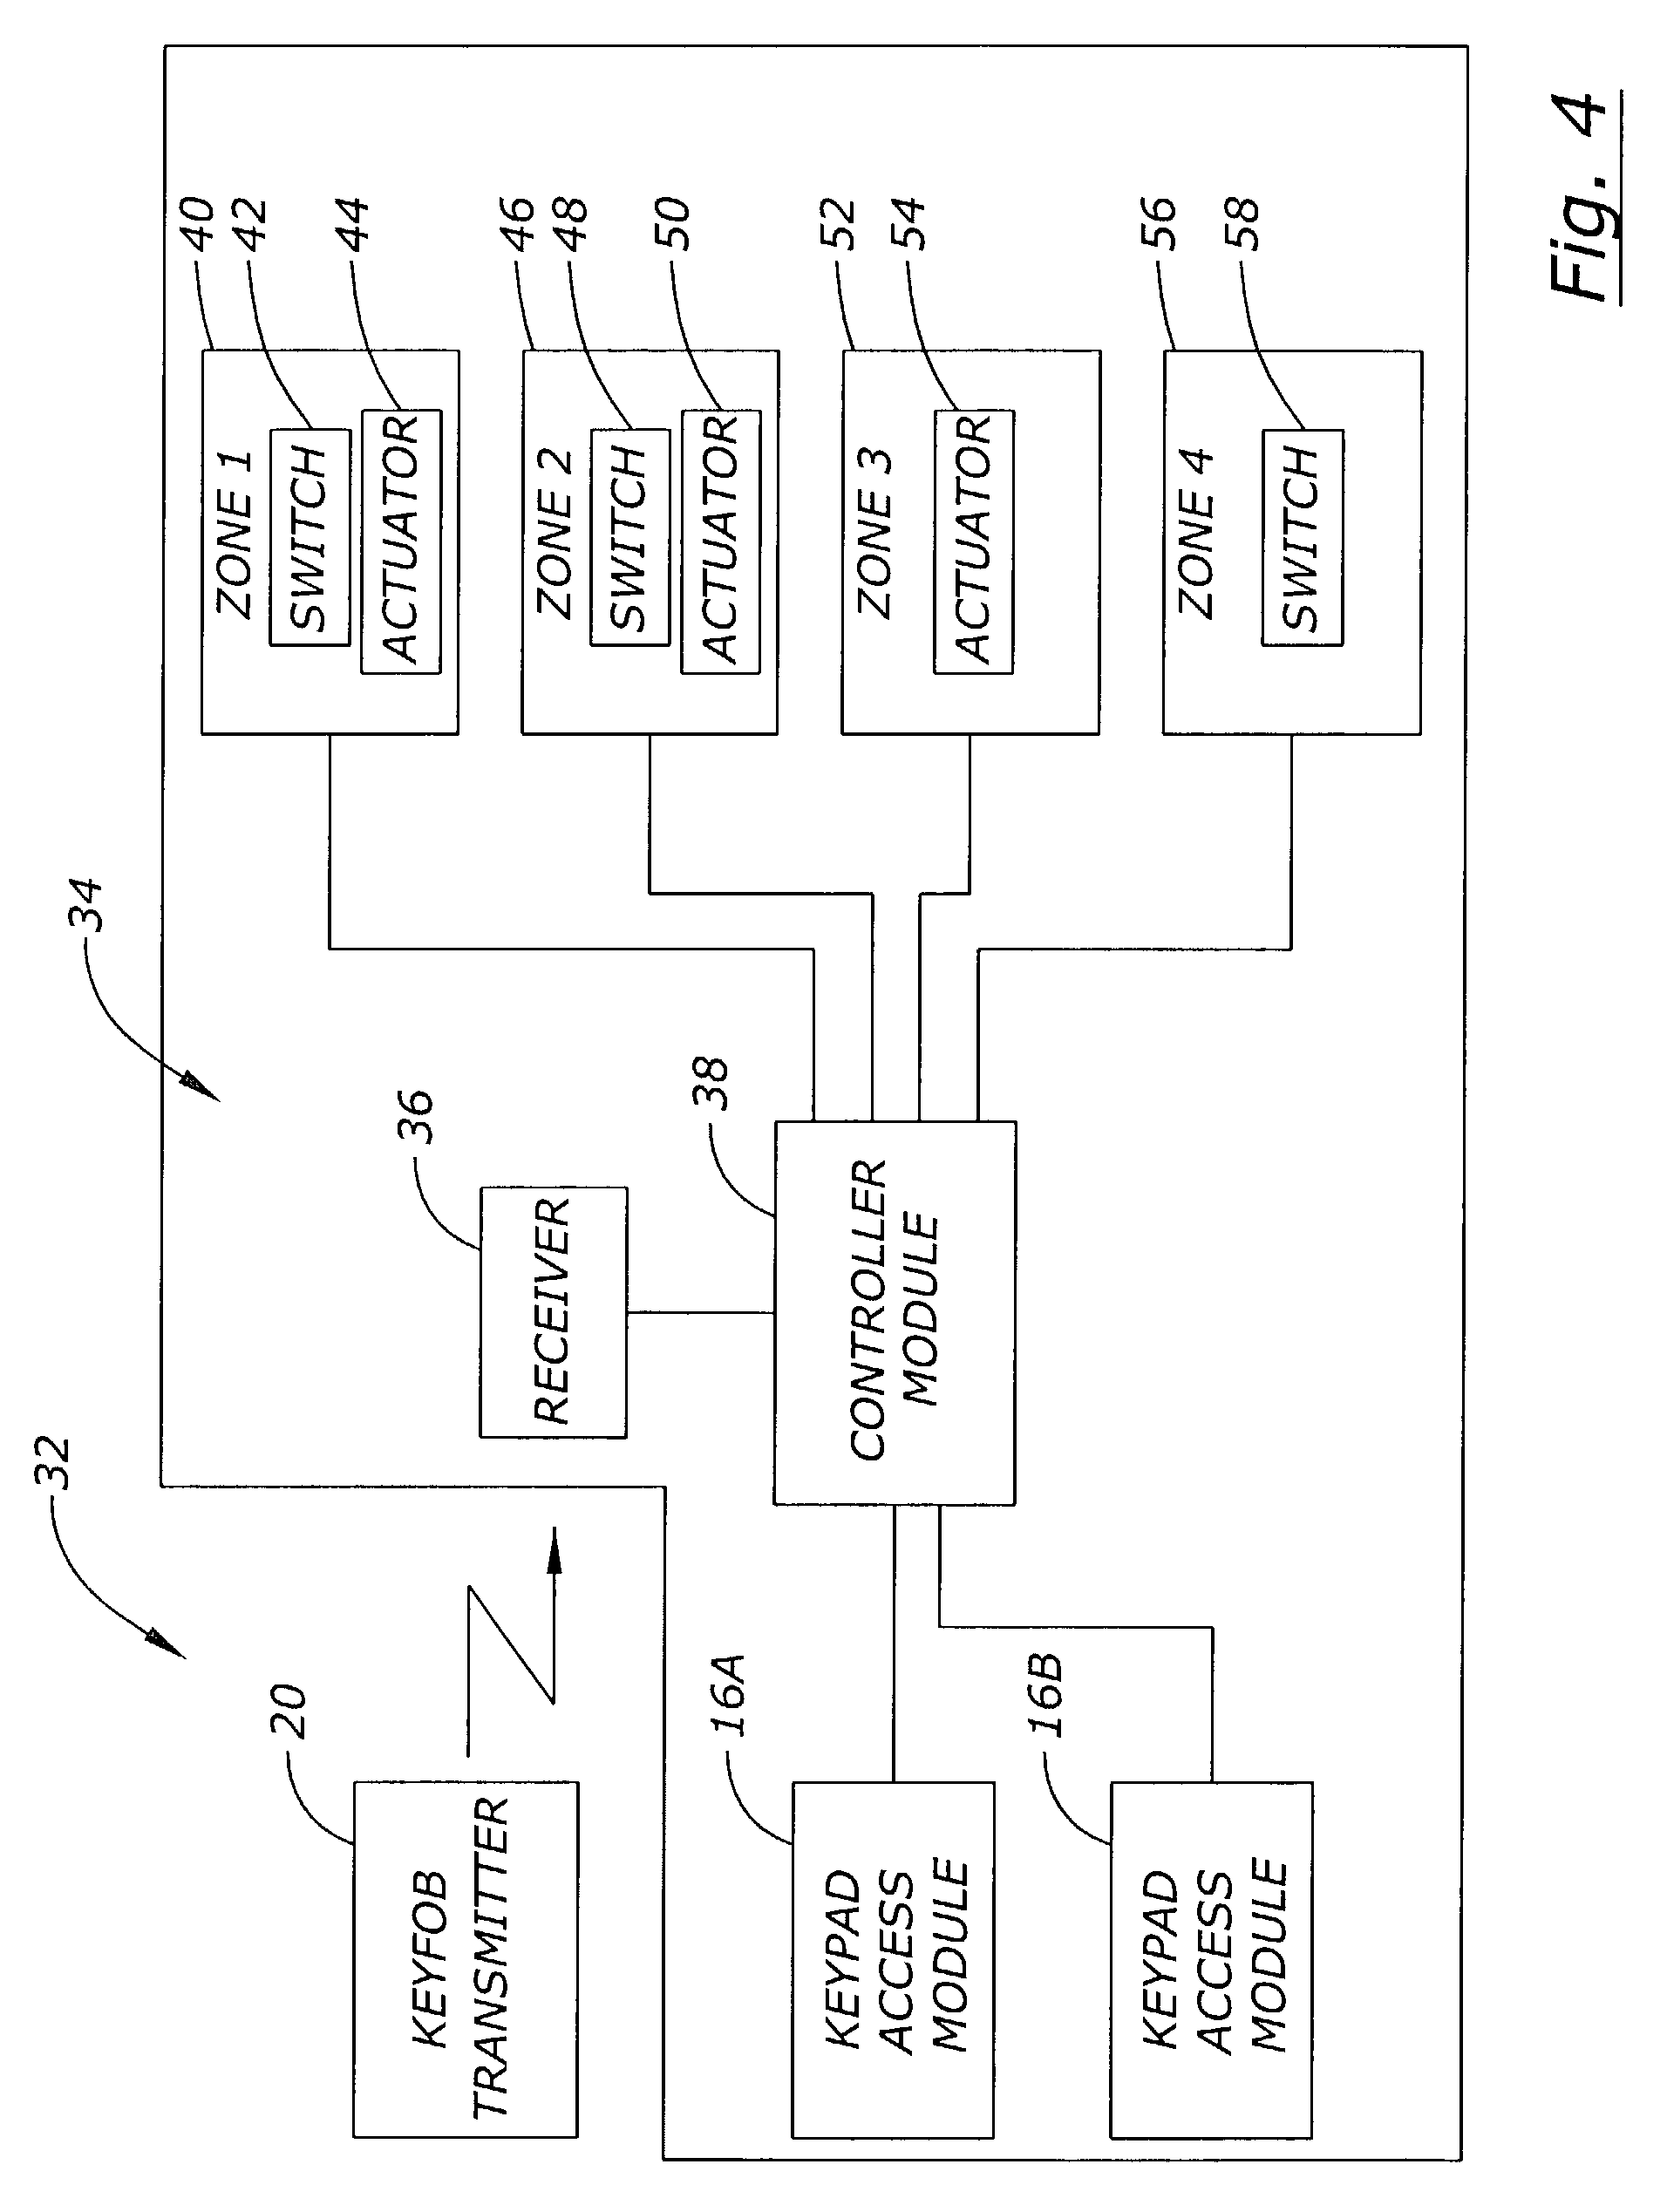 access 2 communications keyless entry system bulldog security wiring on 2006  silverado transmission diagram,